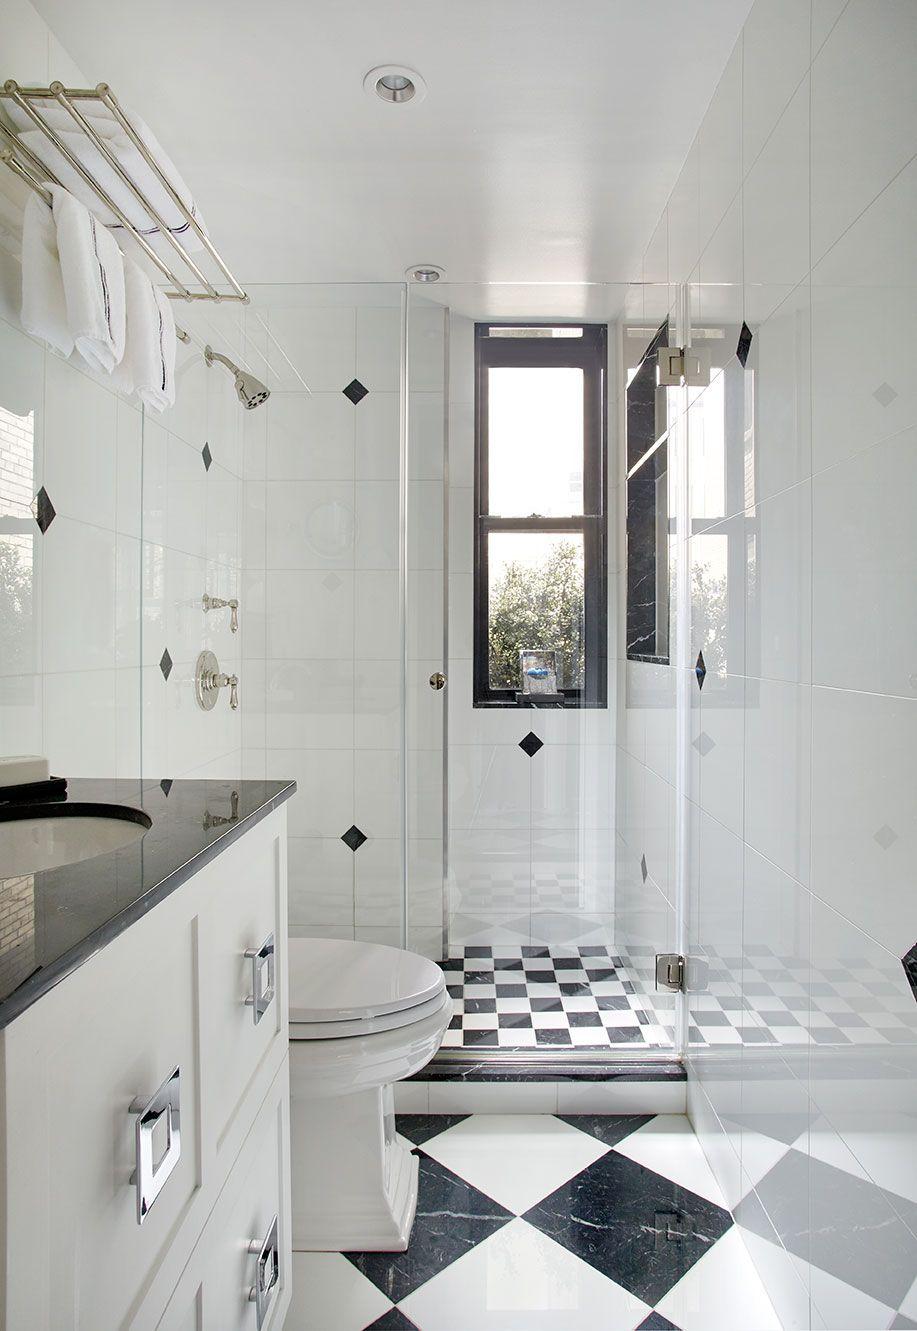 Classic black and white tile in bathroom design | Opum.AD ...